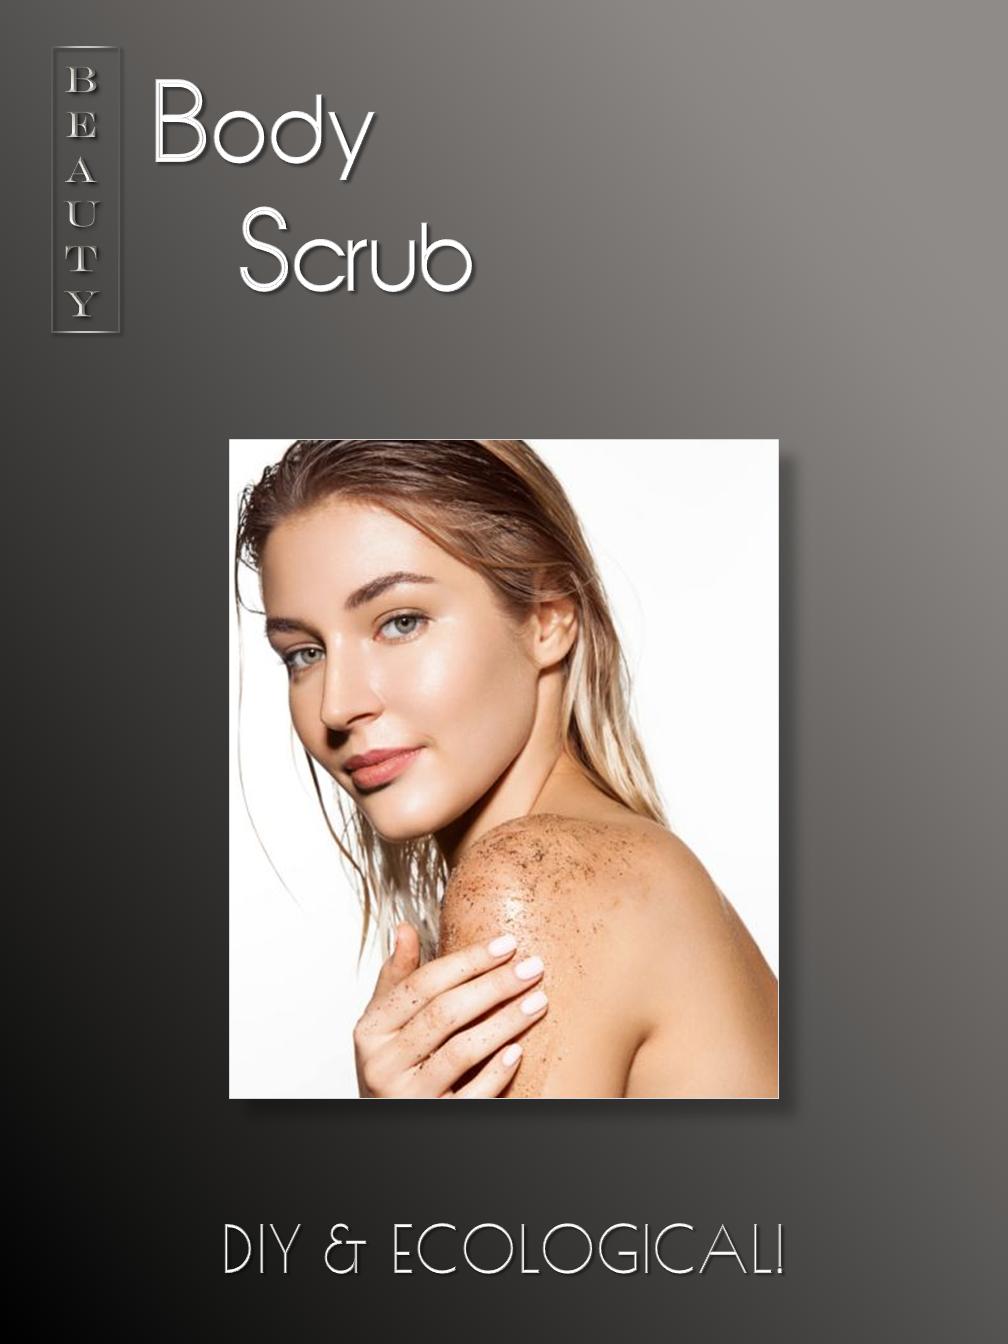 Body Scub